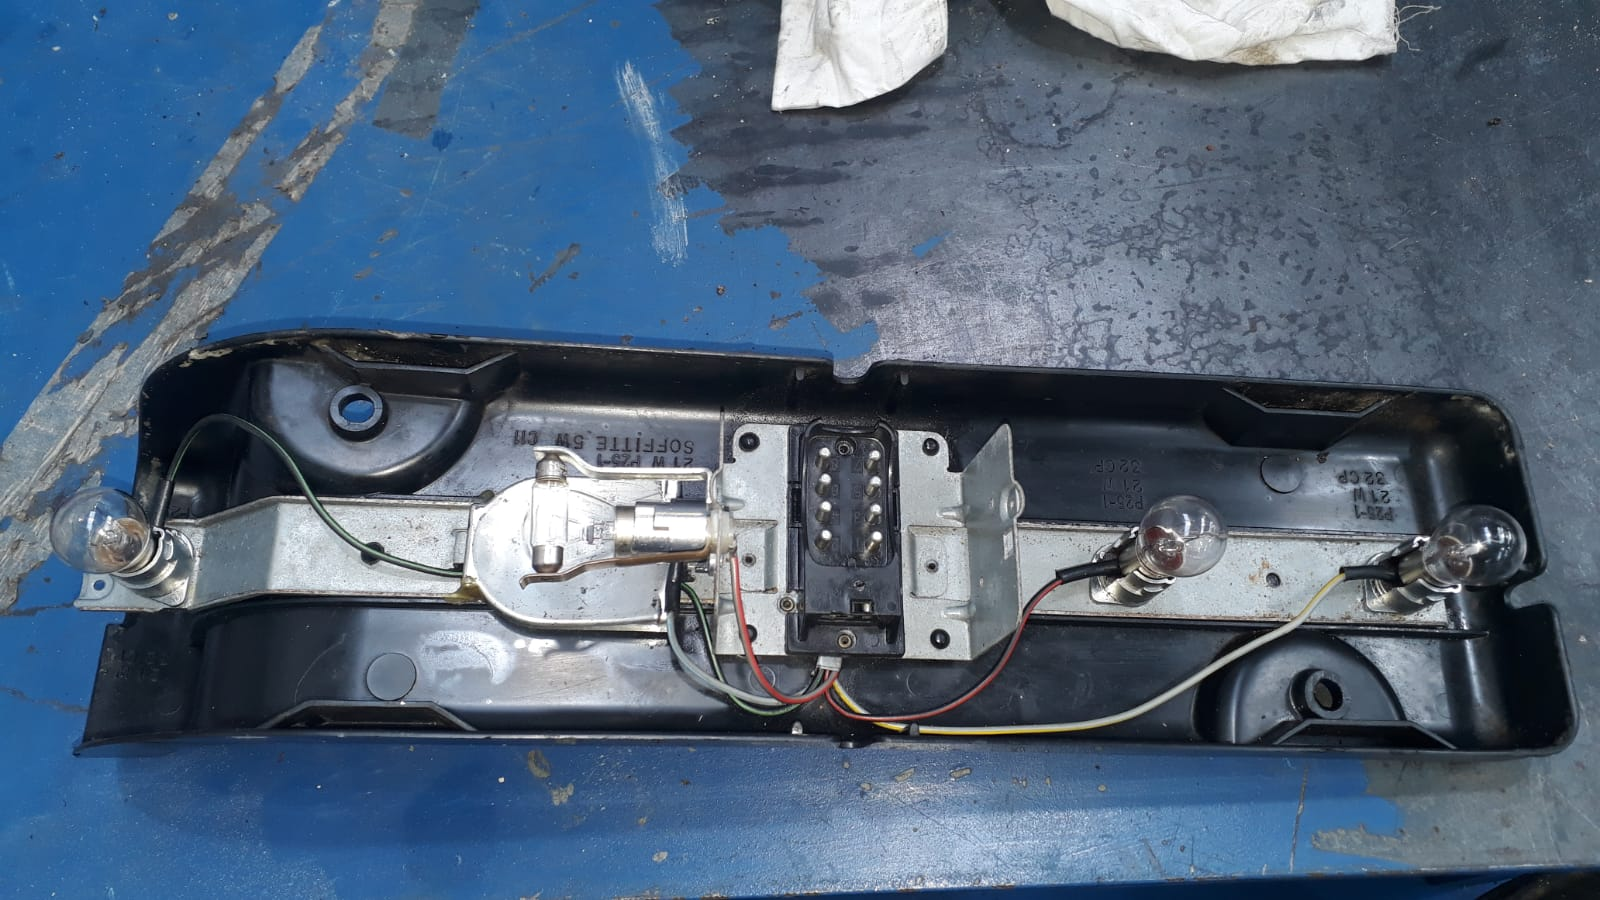 More Mercedes parts to sort…